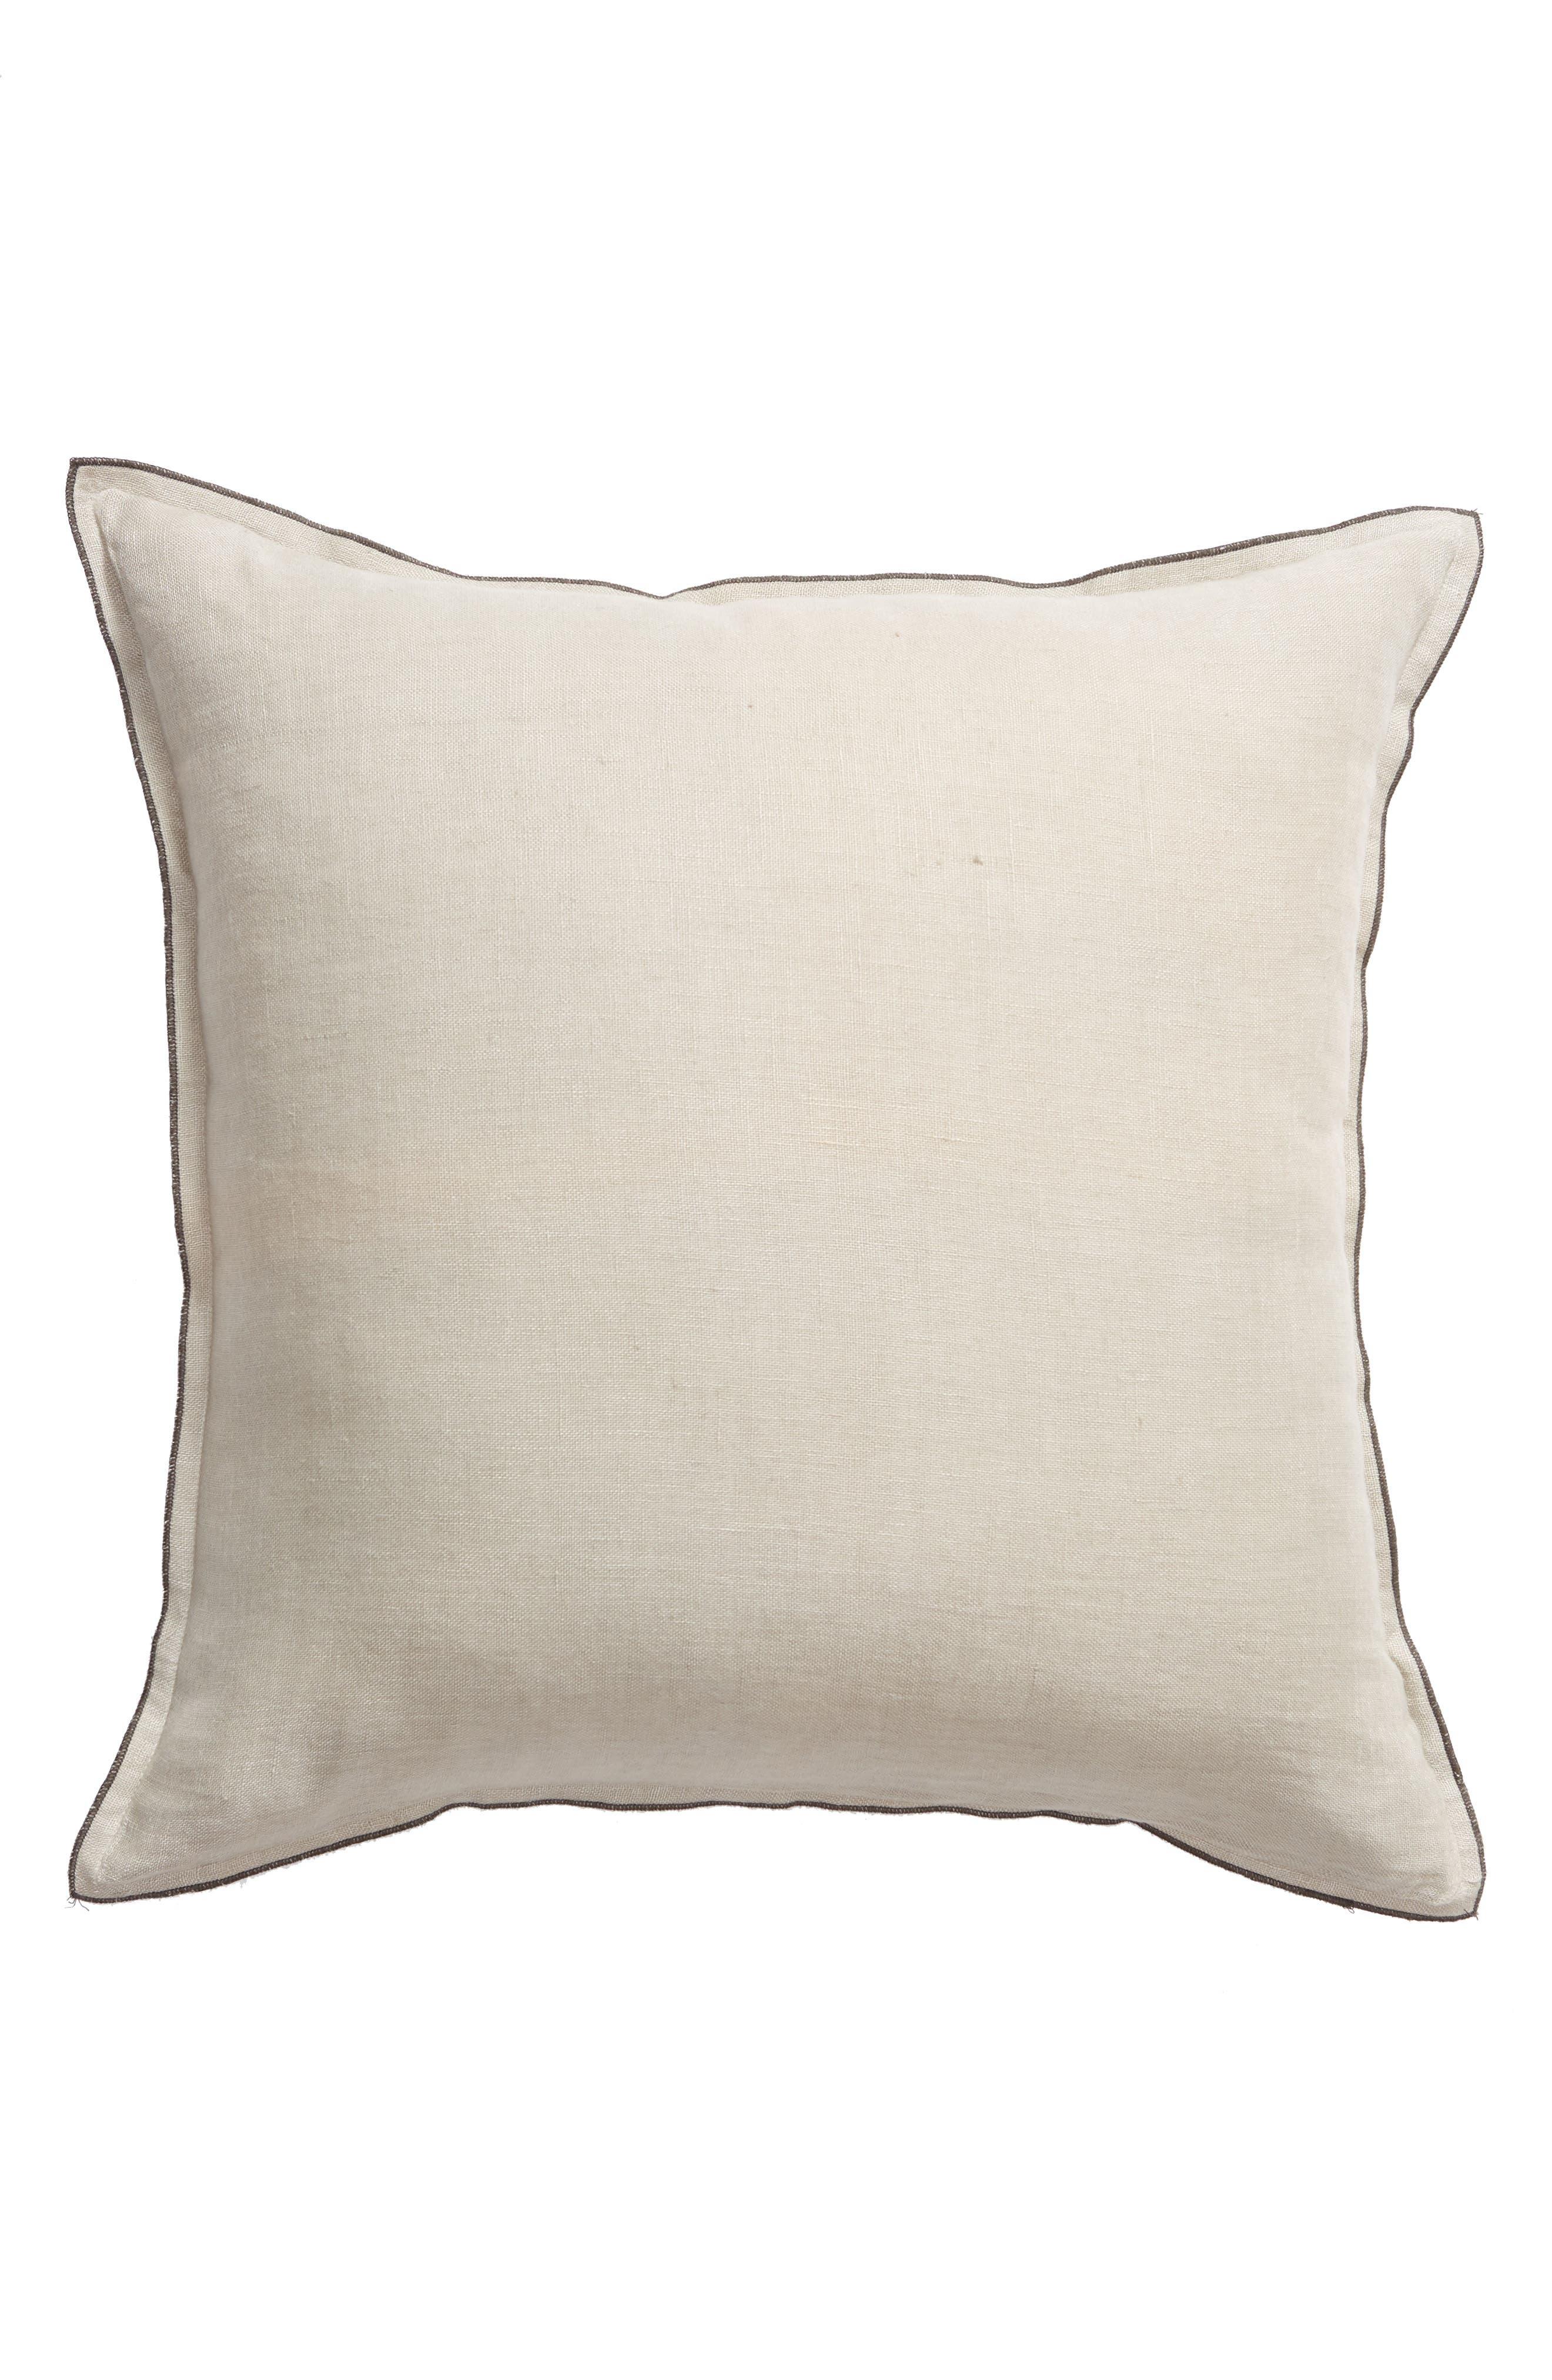 Linen Accent Pillow,                             Main thumbnail 1, color,                             GREY OWL